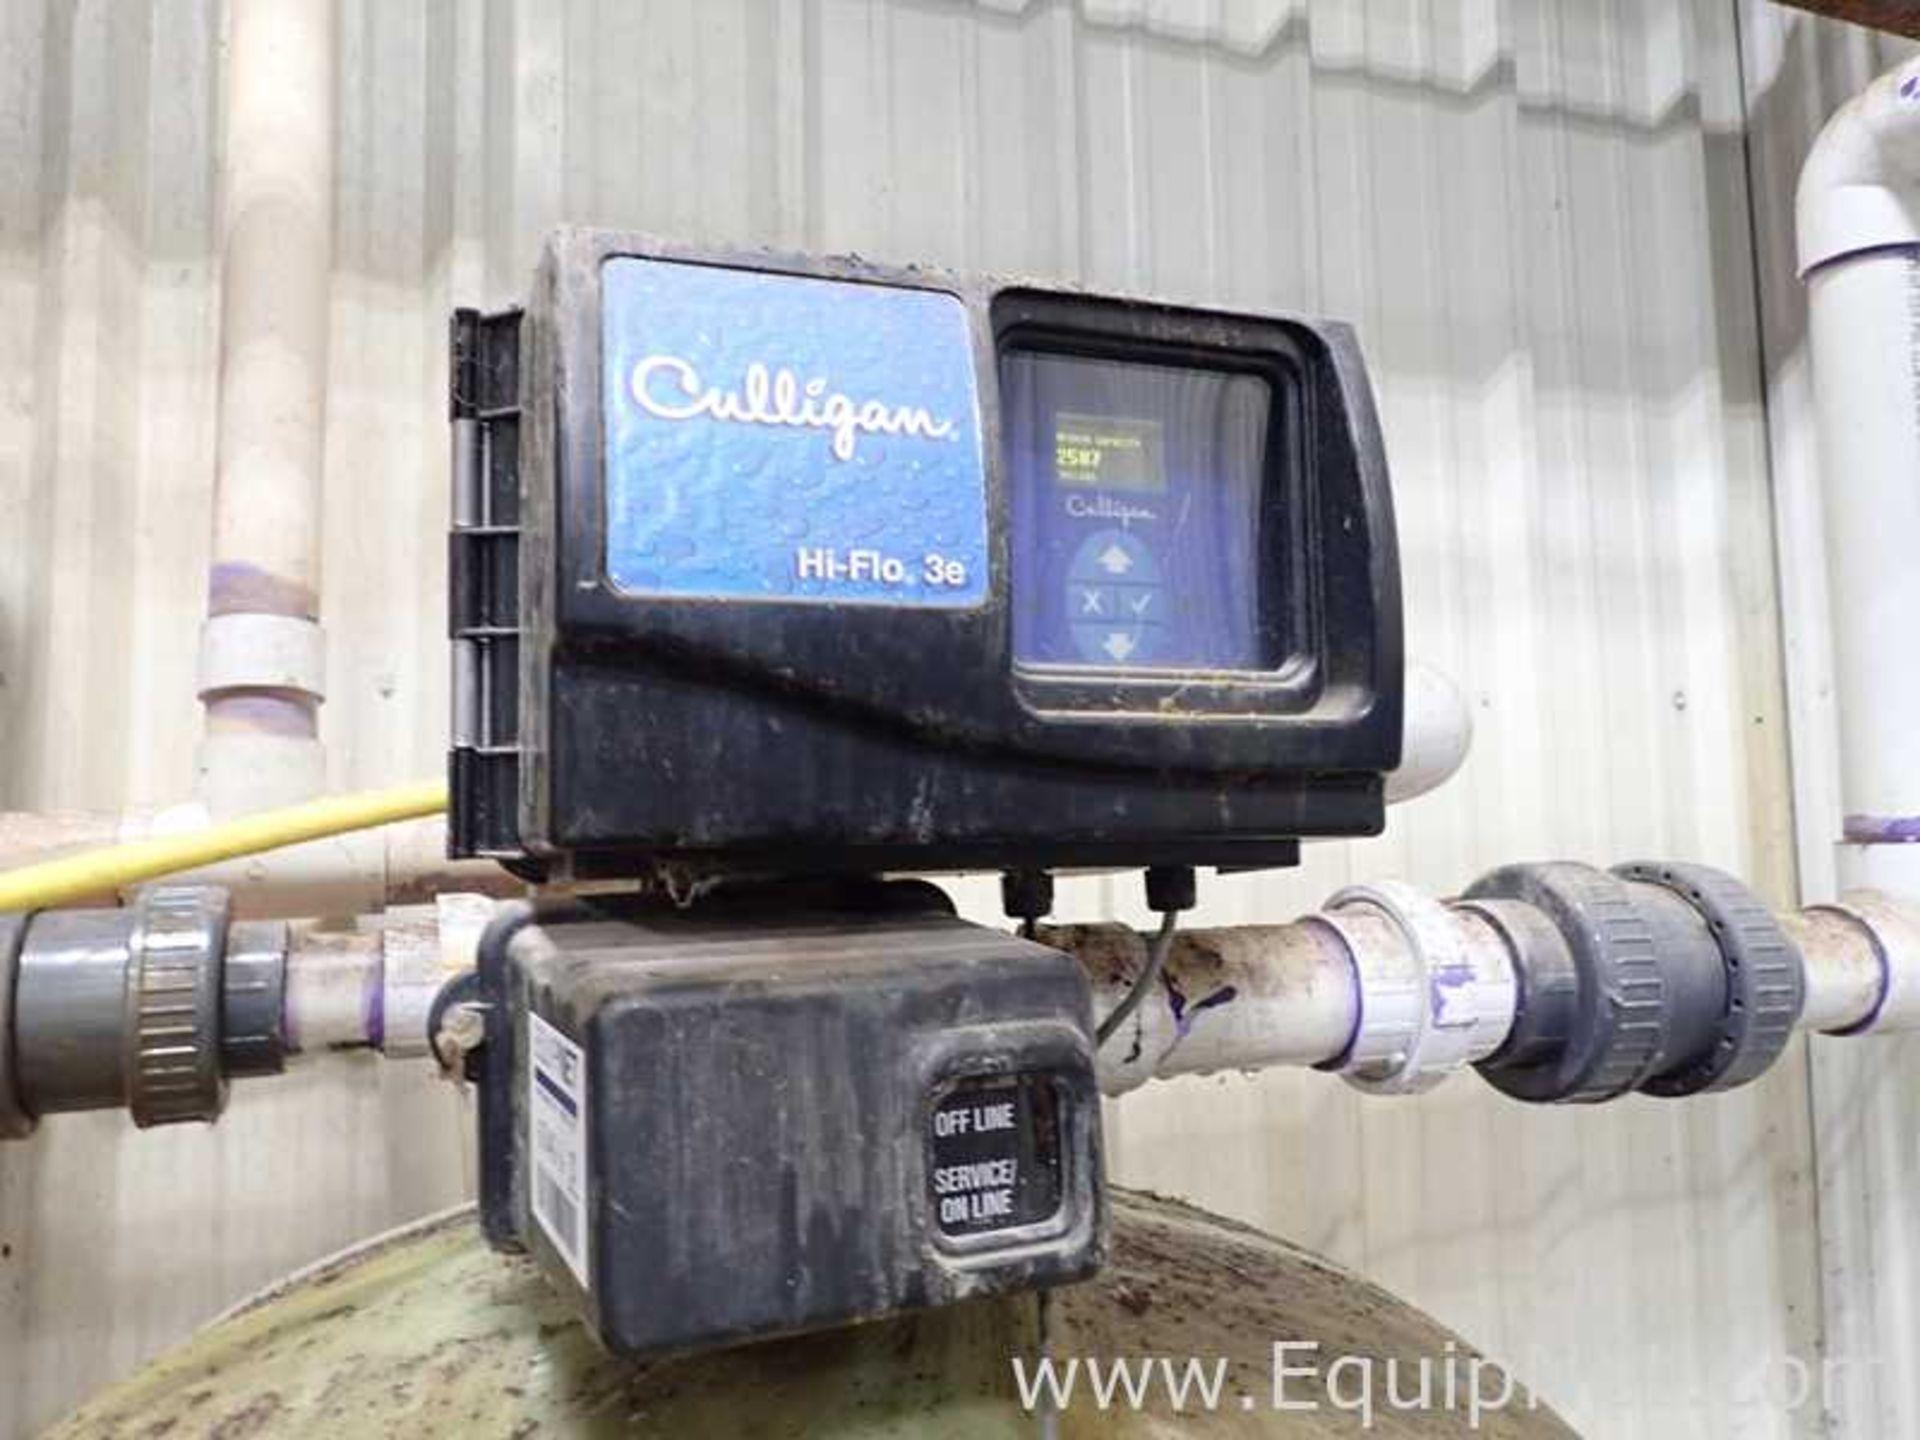 Culligan Hi-Flo 3e Water Softener System - Image 8 of 9